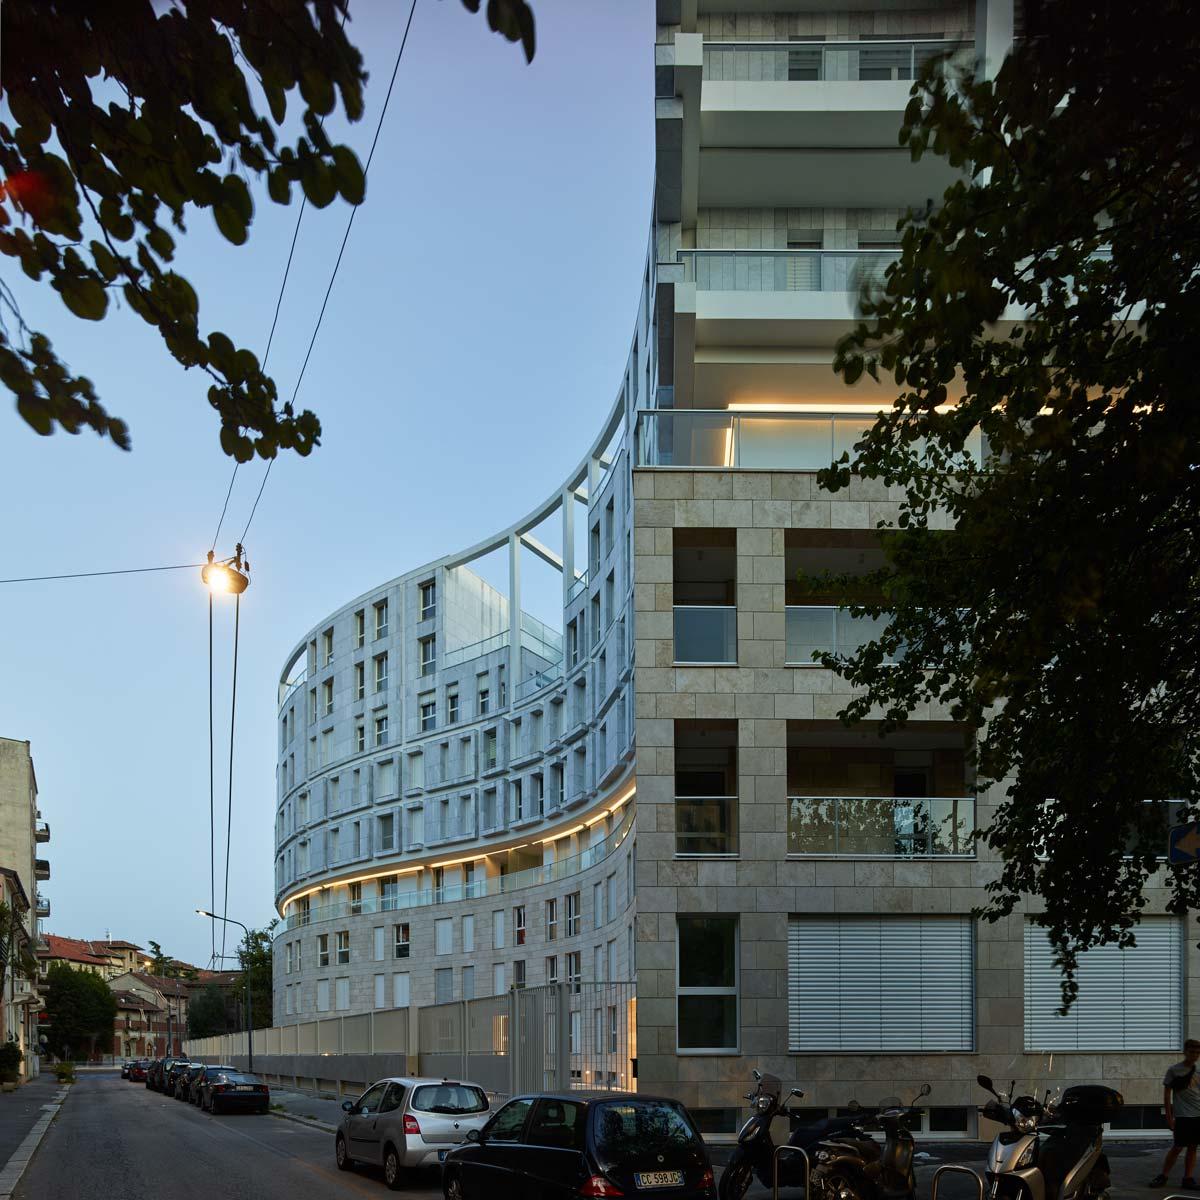 Degli-Esposti-Architetti-Milan-Residenze-Carlo-Erba-05